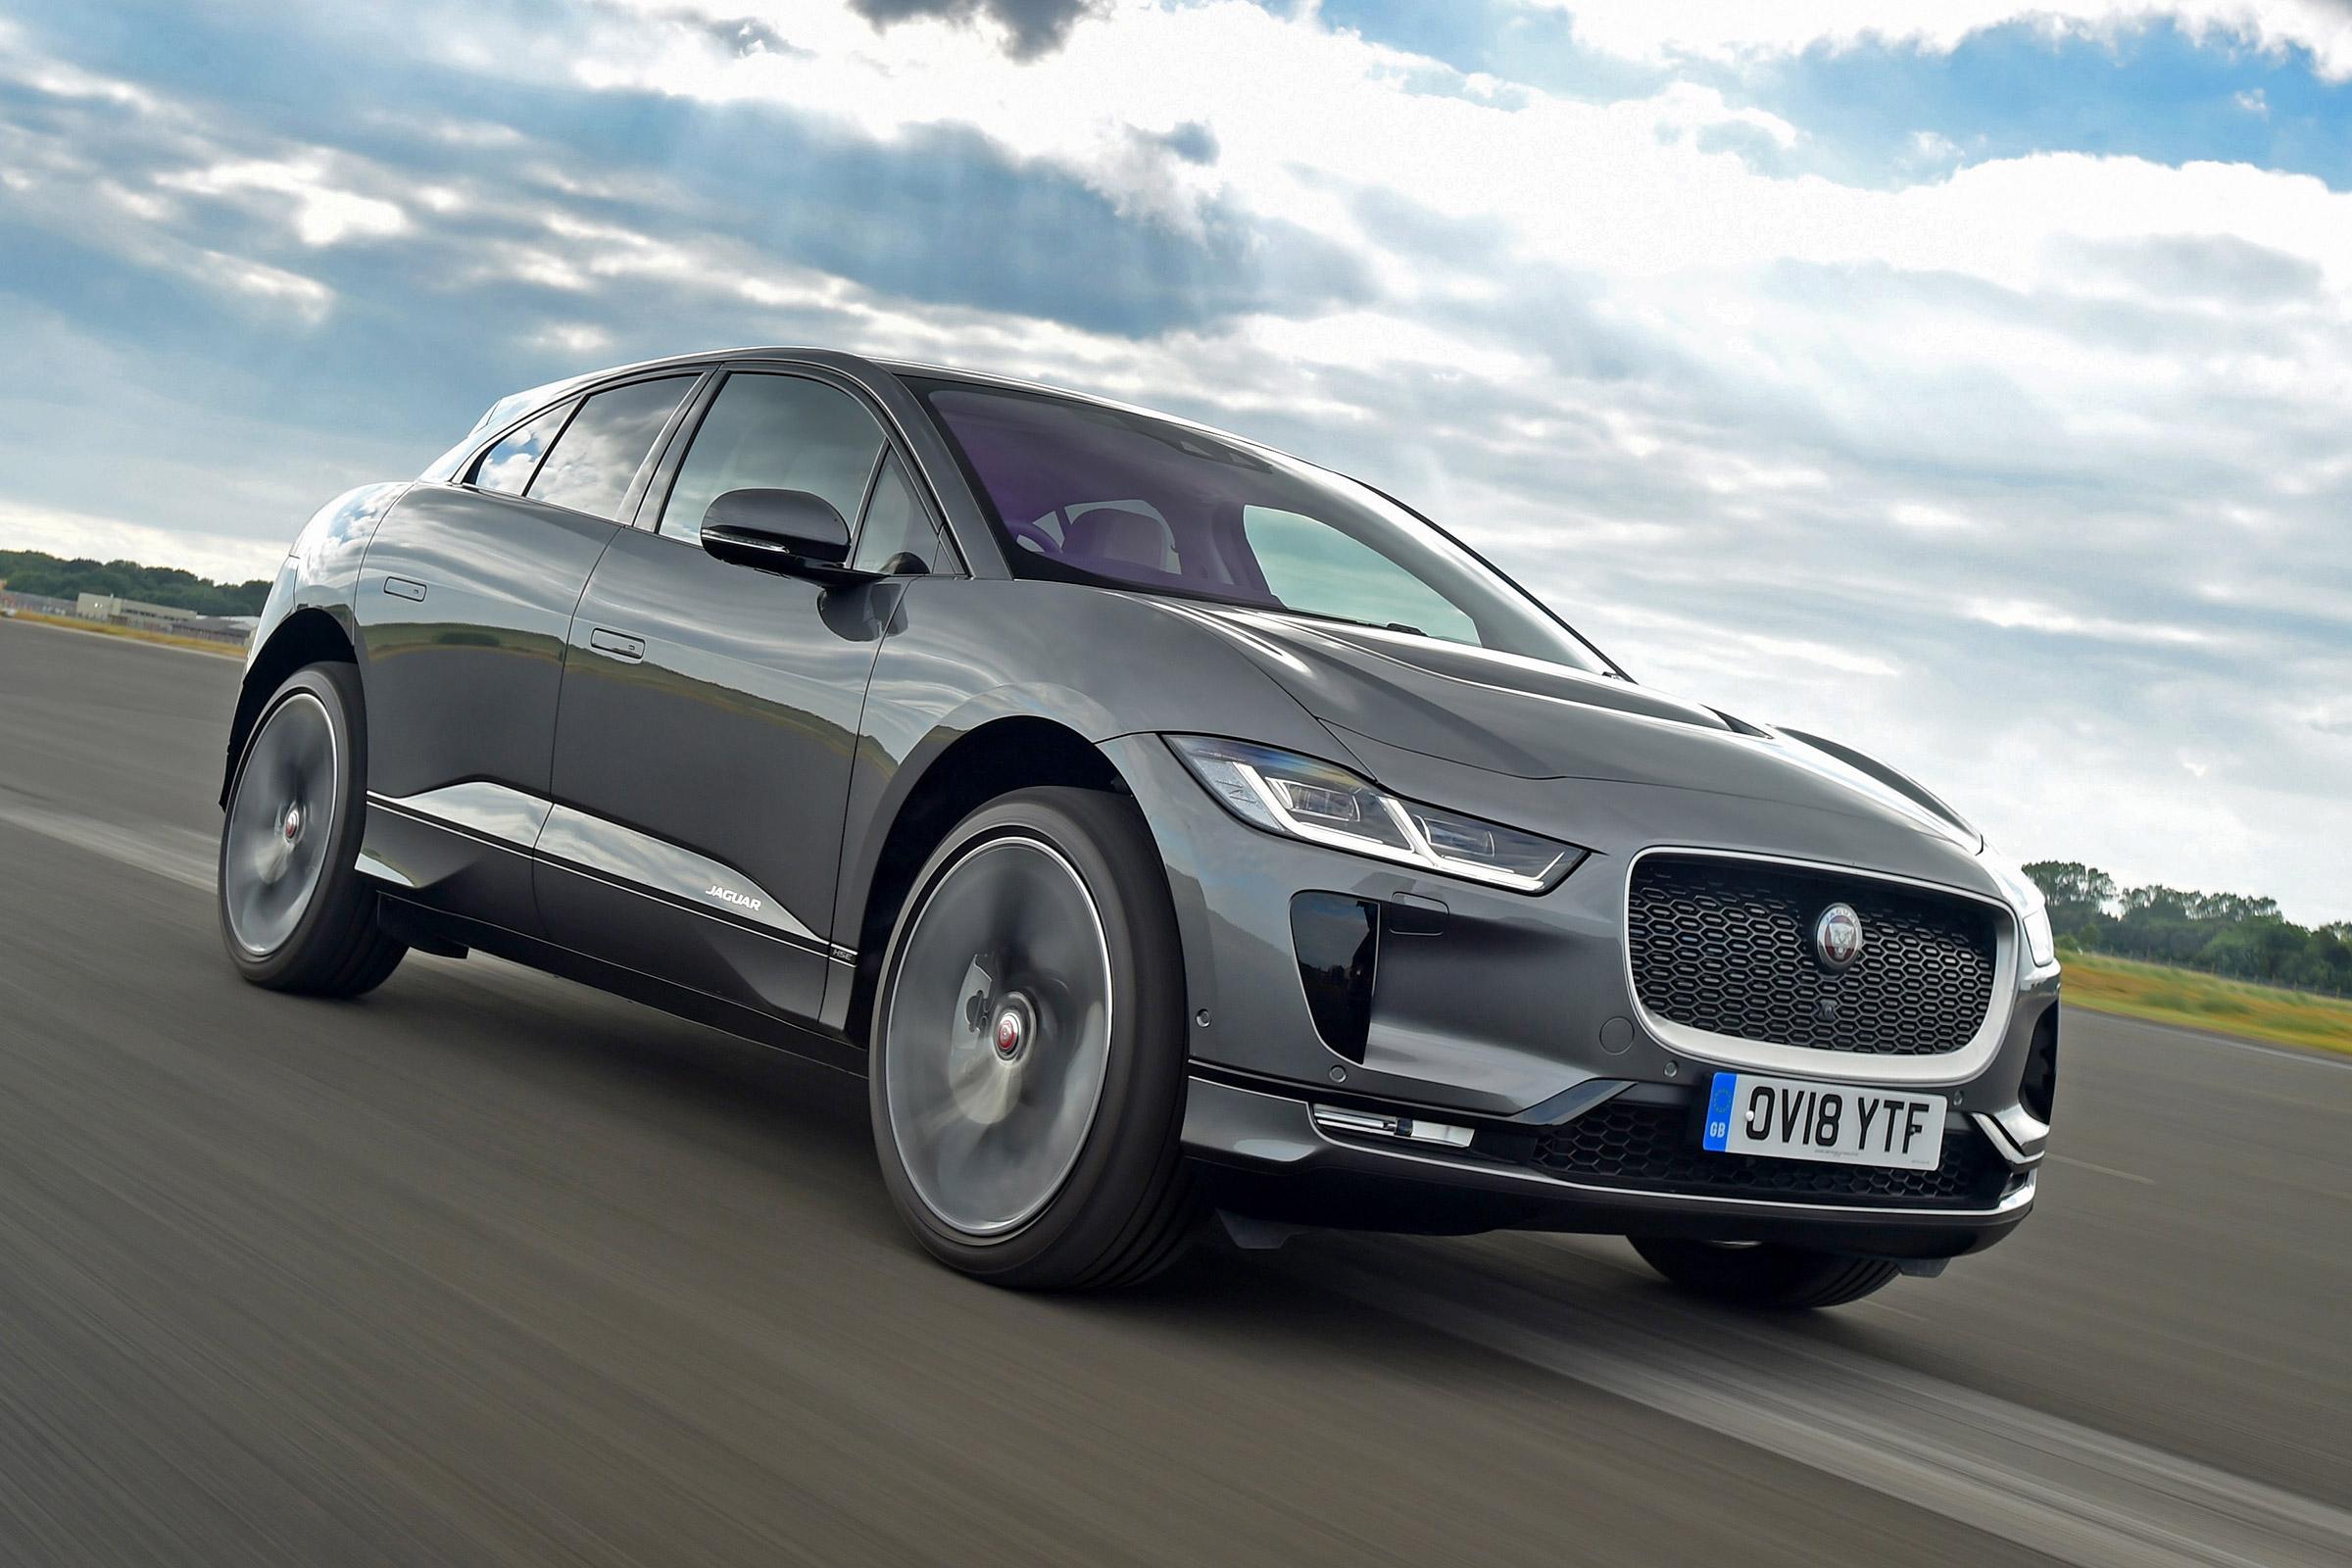 [Privat- & Gewerbeleasing] Jaguar I-Pace S Automatik (400PS) mtl. 359,39€ (netto) / 425,98€ (brutto), LF 0,54, 48 Mon.,10.000km, inkl. Wartung & Verschleiß